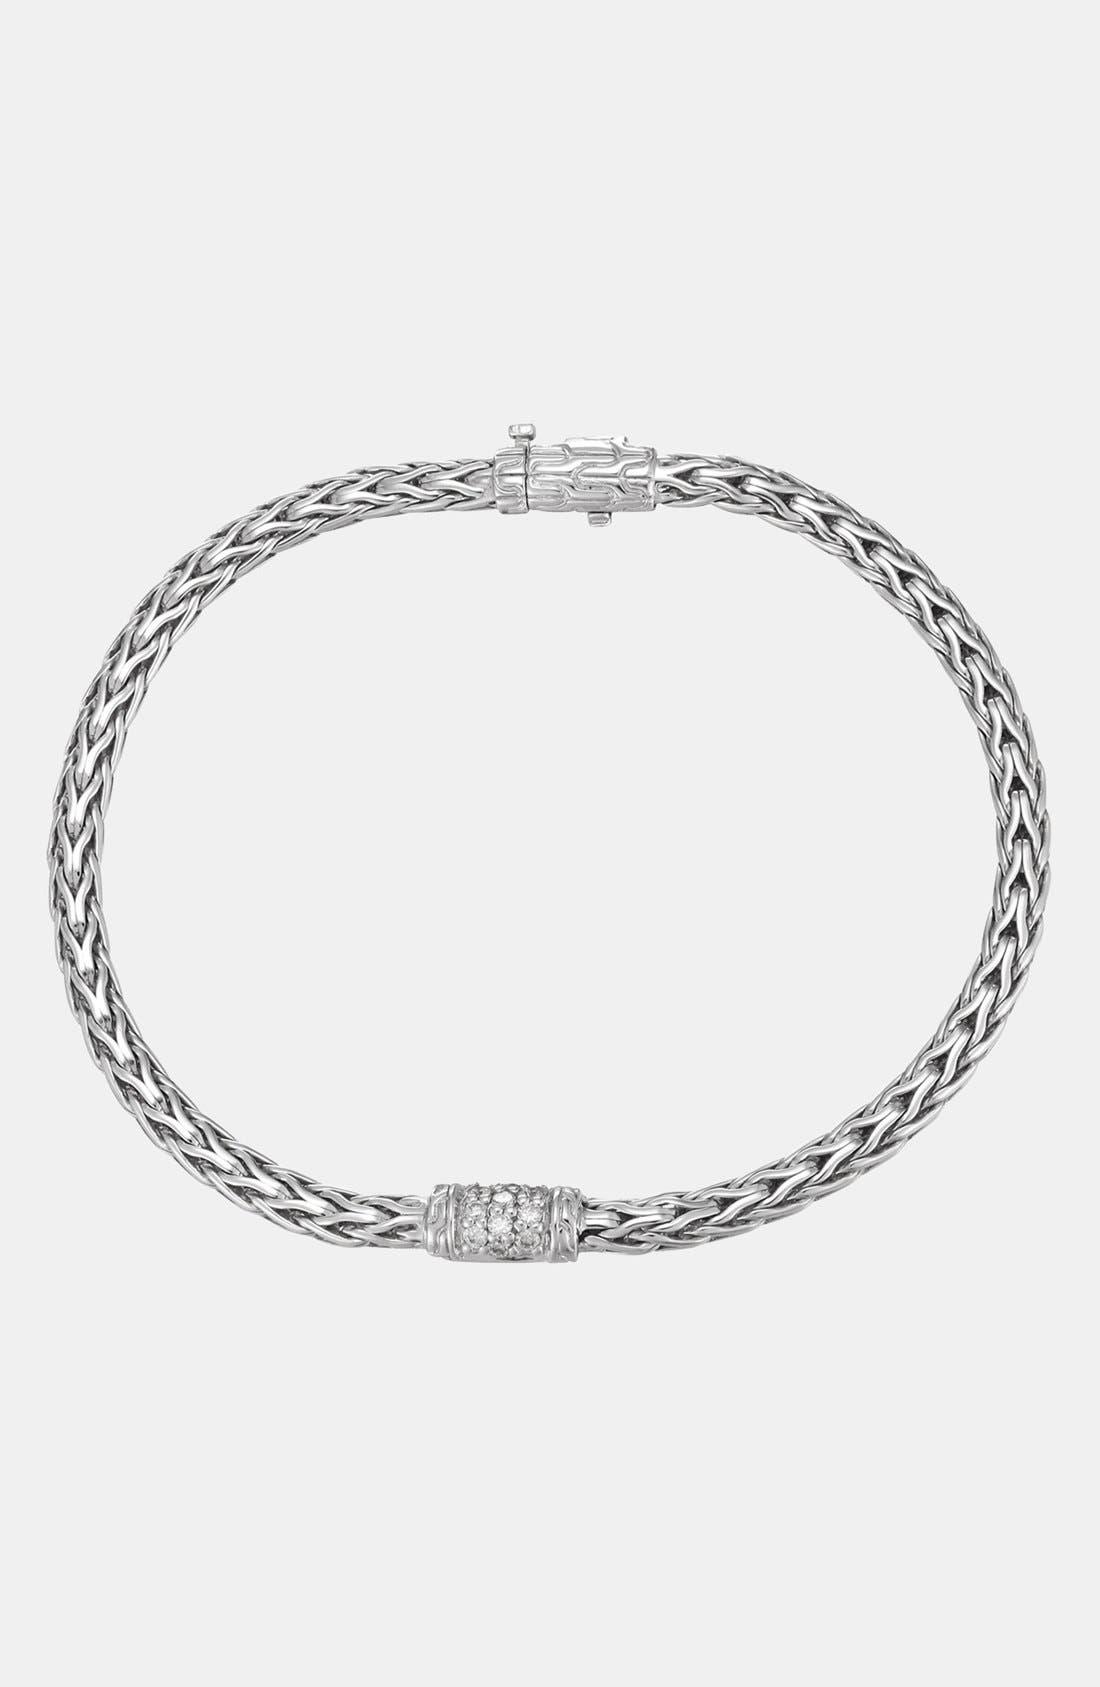 Alternate Image 1 Selected - John Hardy 'Classic Chain' Small Pavé Diamond Bracelet